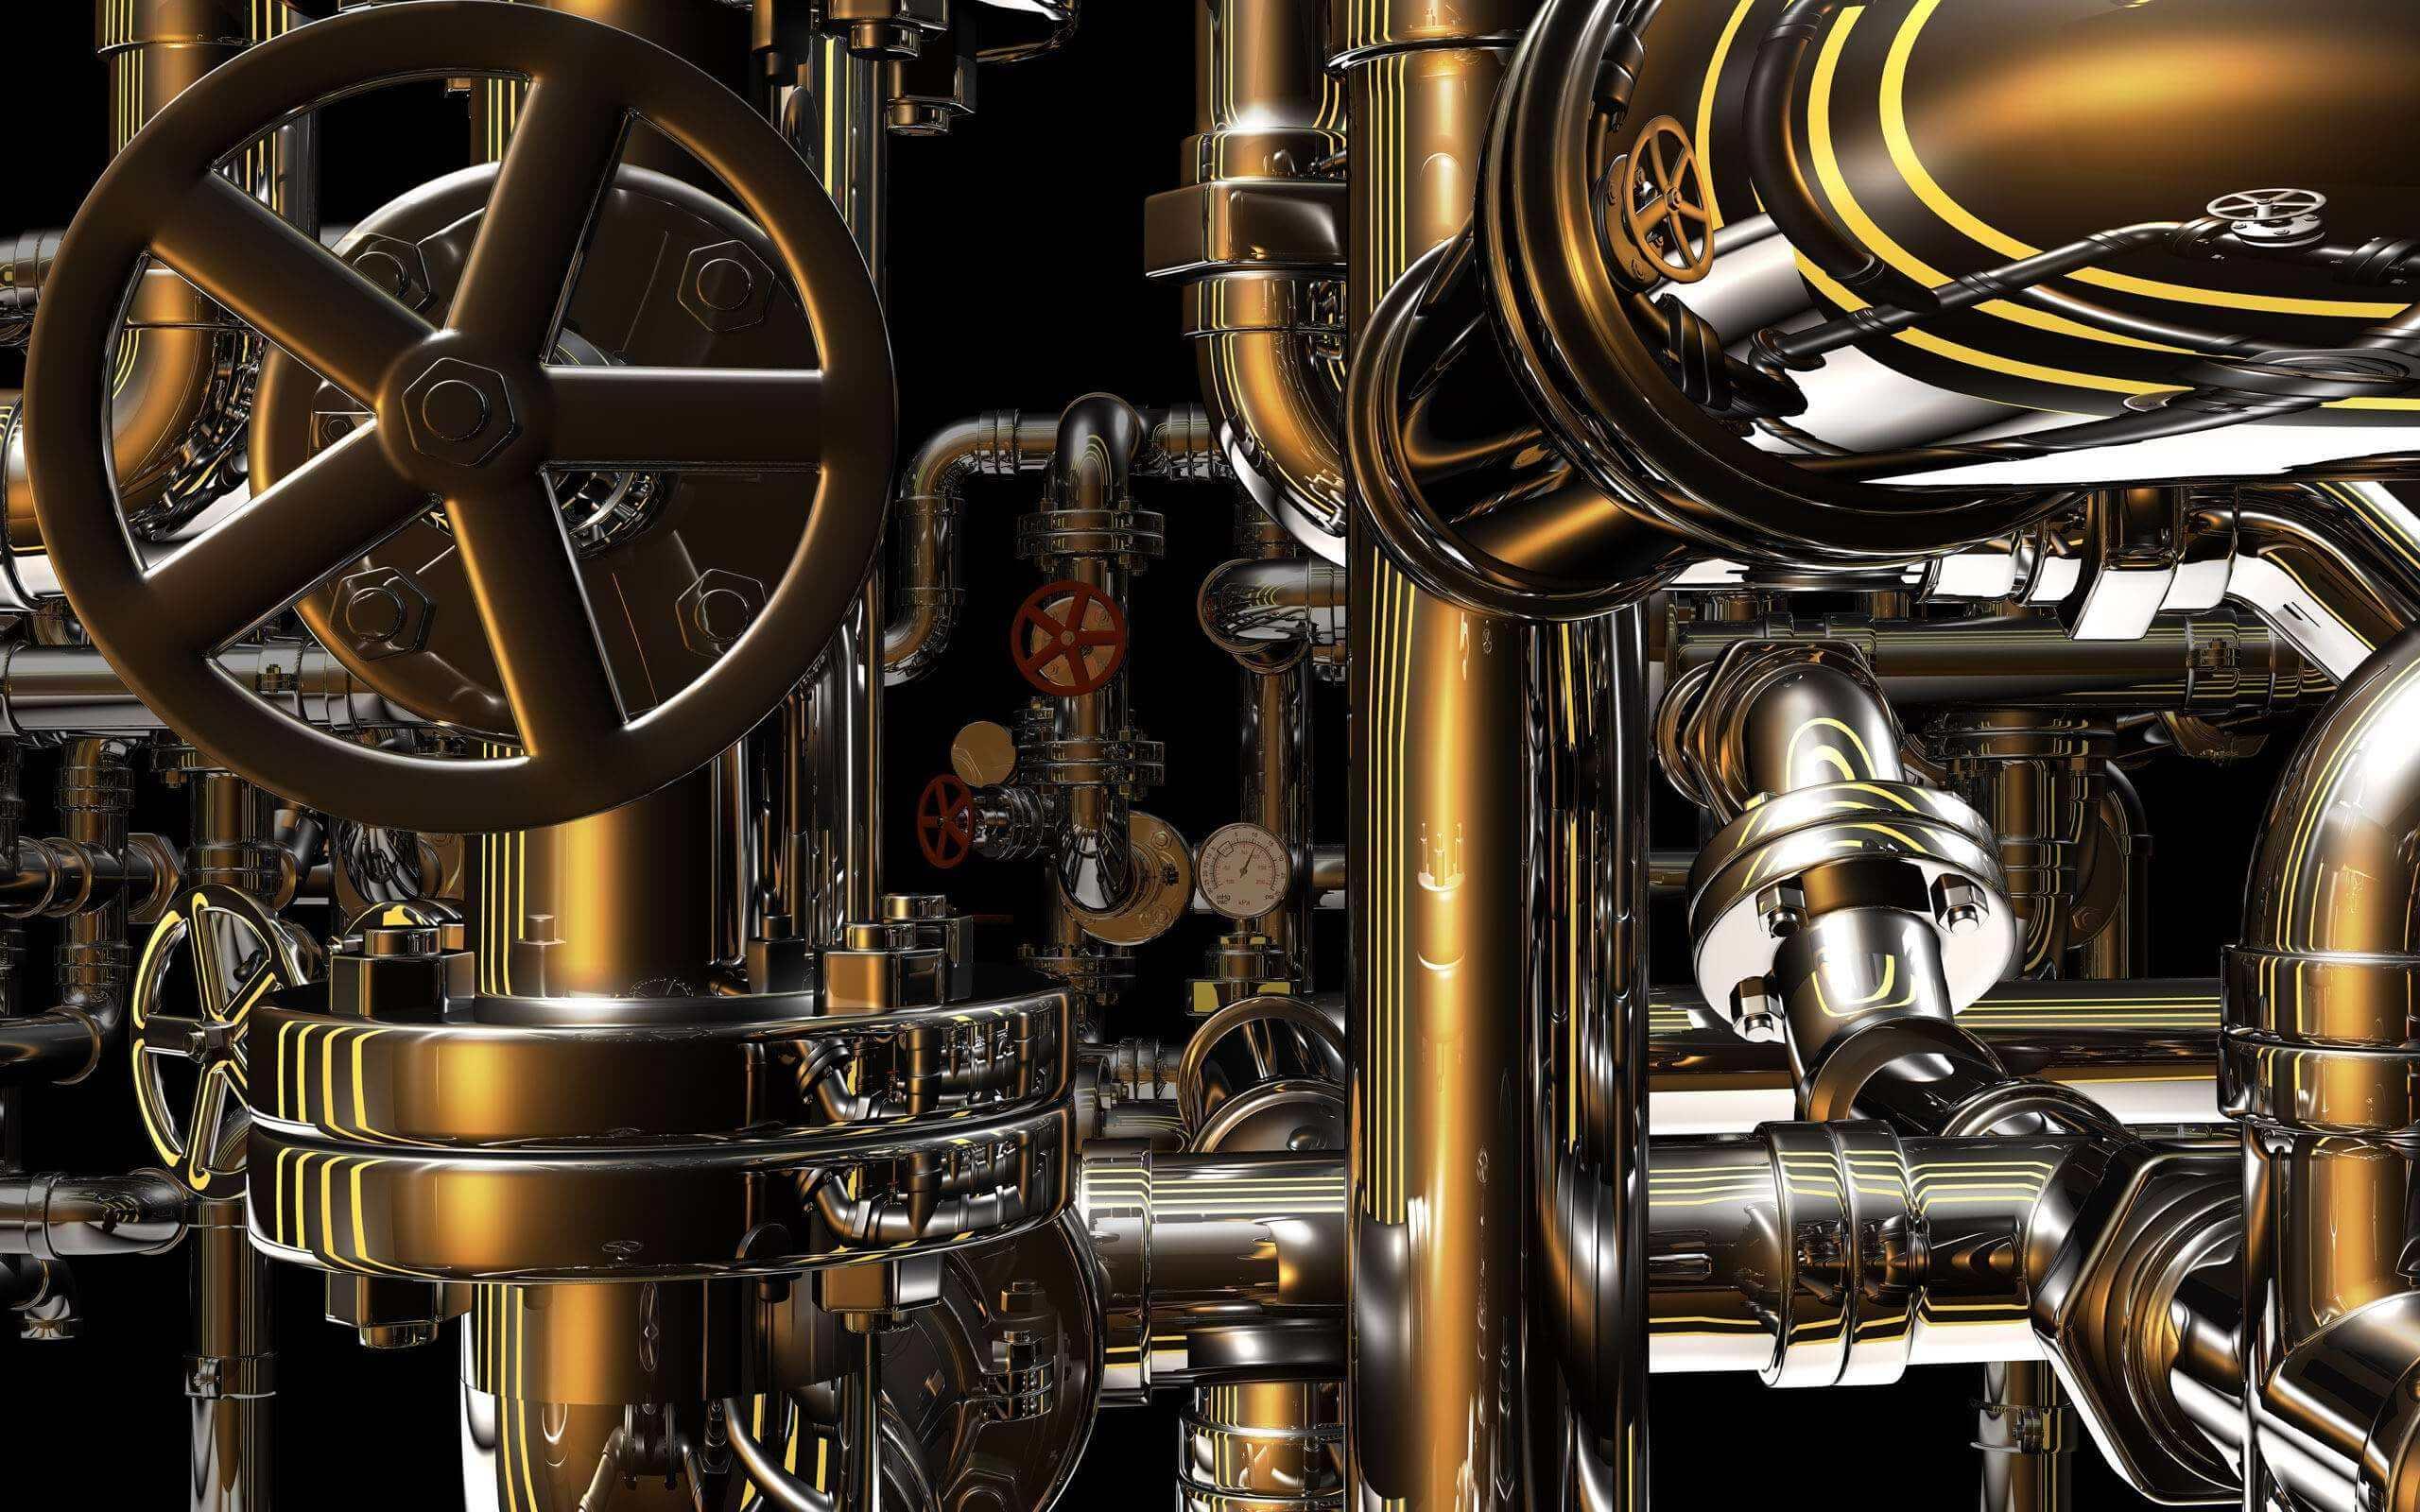 Mechanical engineering wallpaper 01